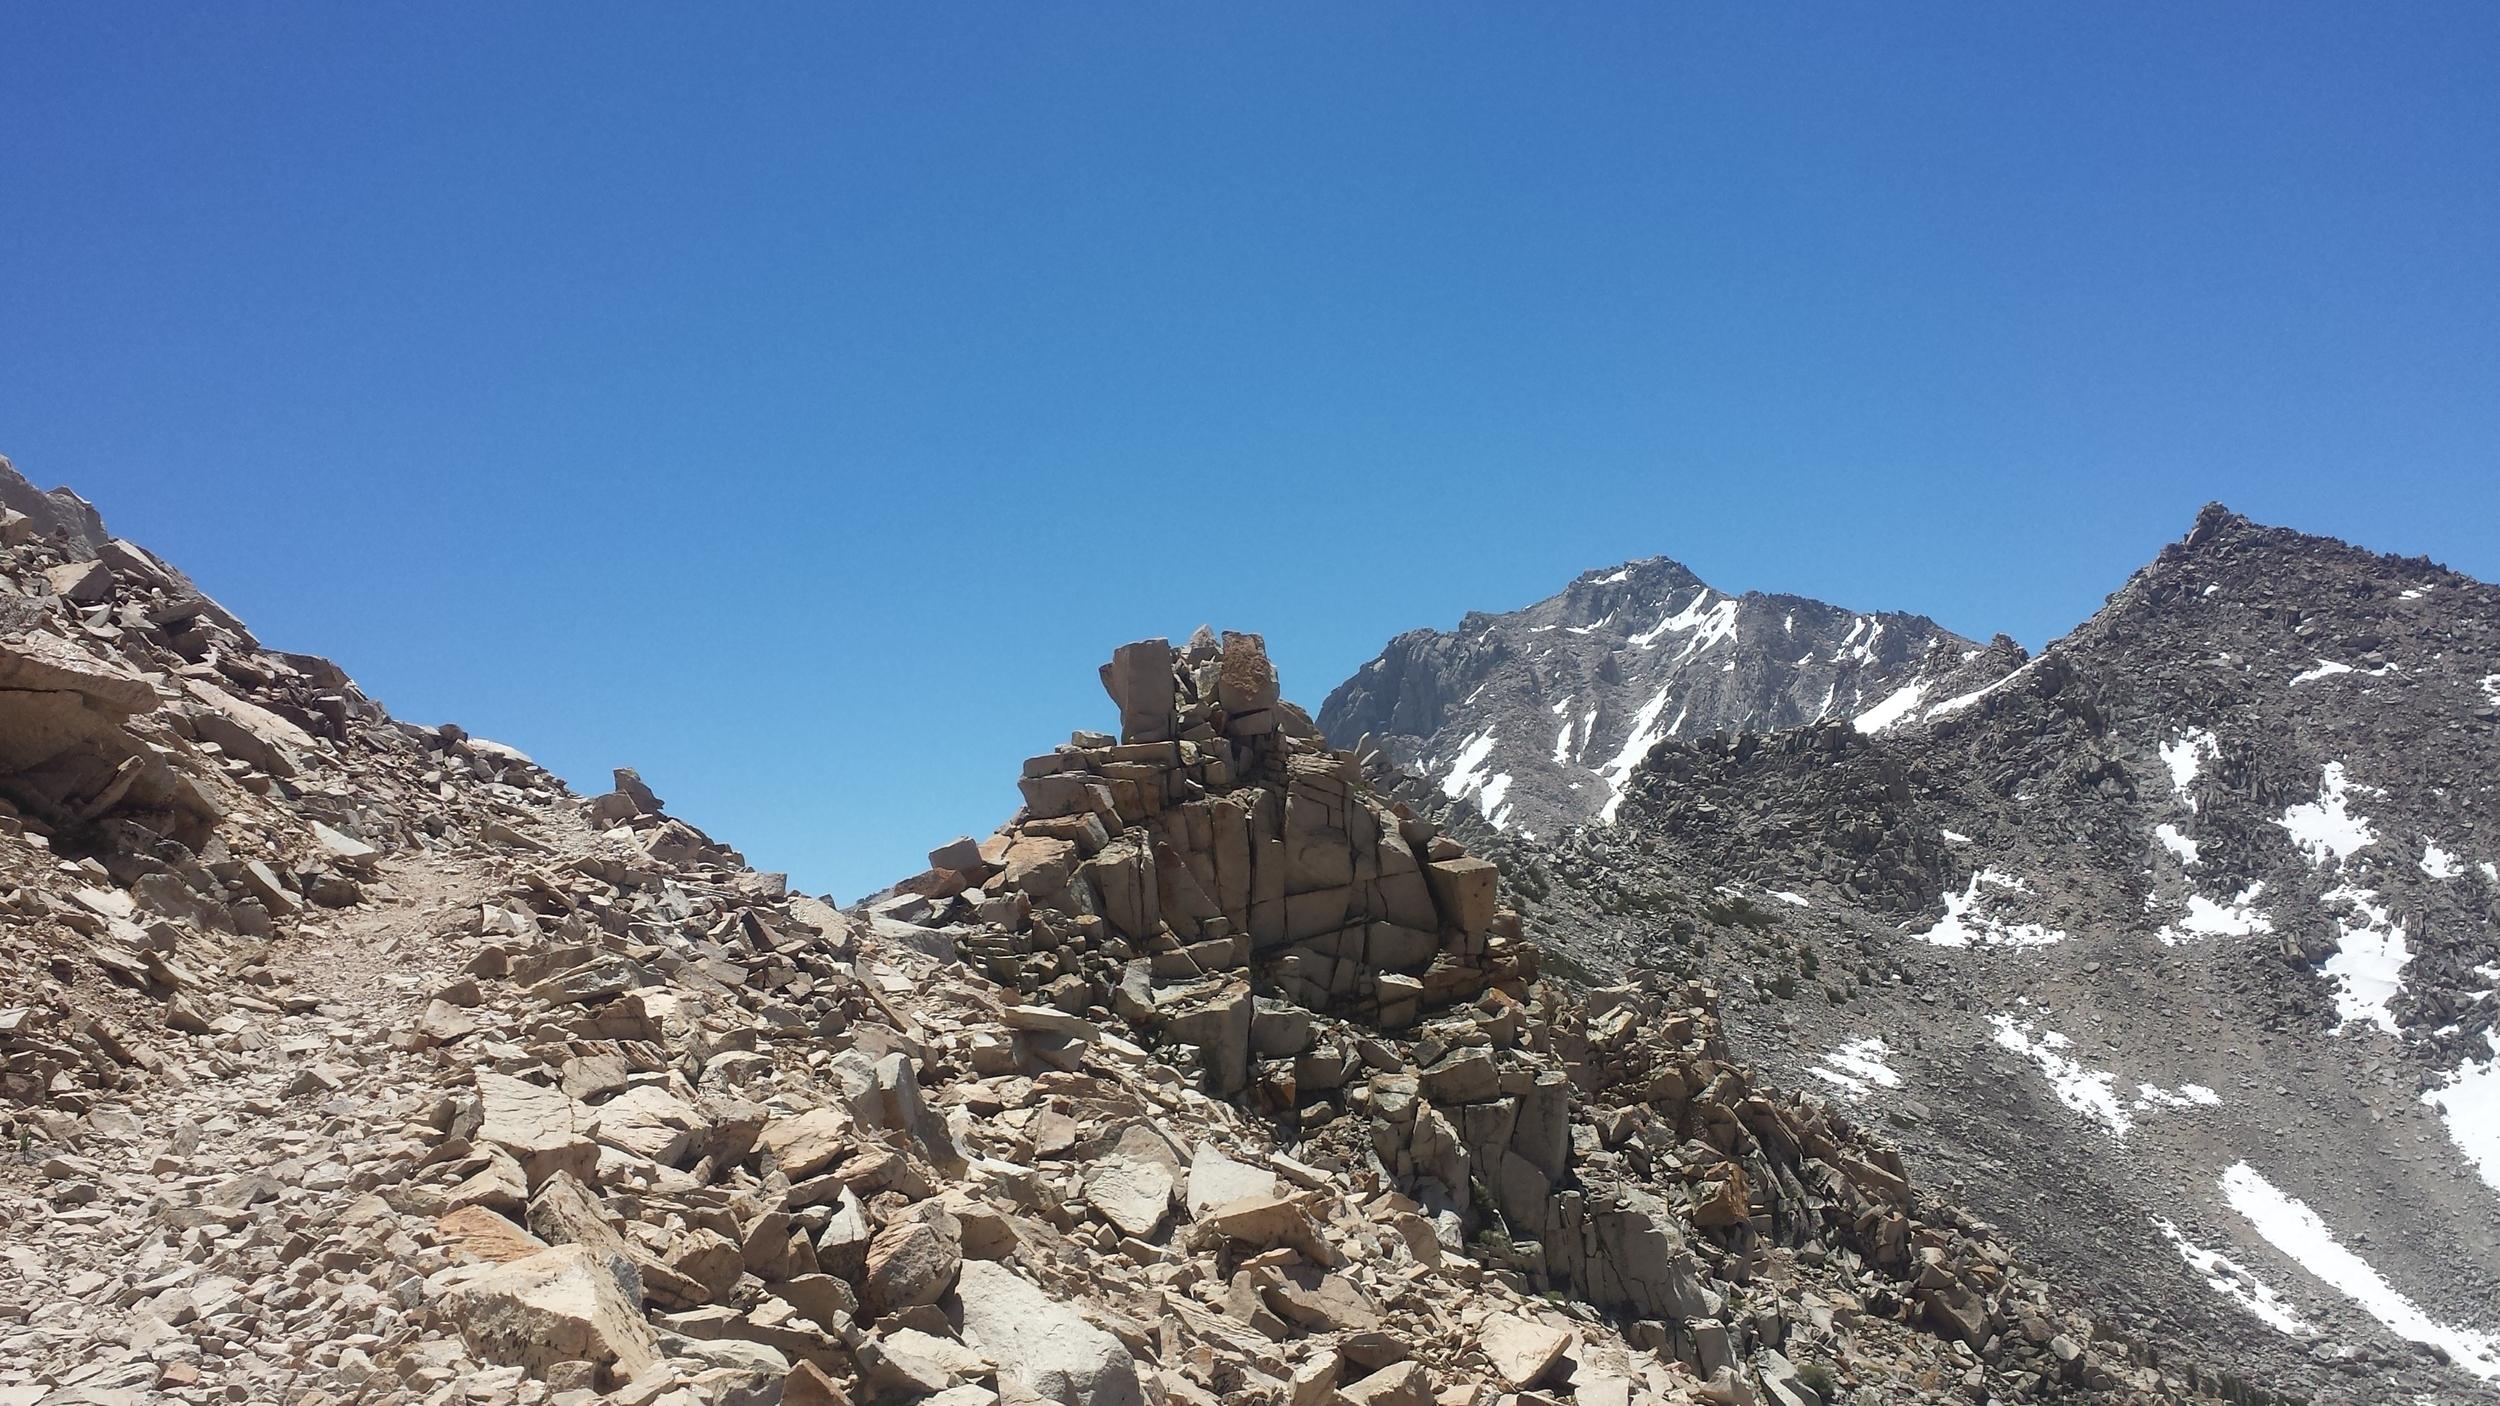 cubist mountaintop